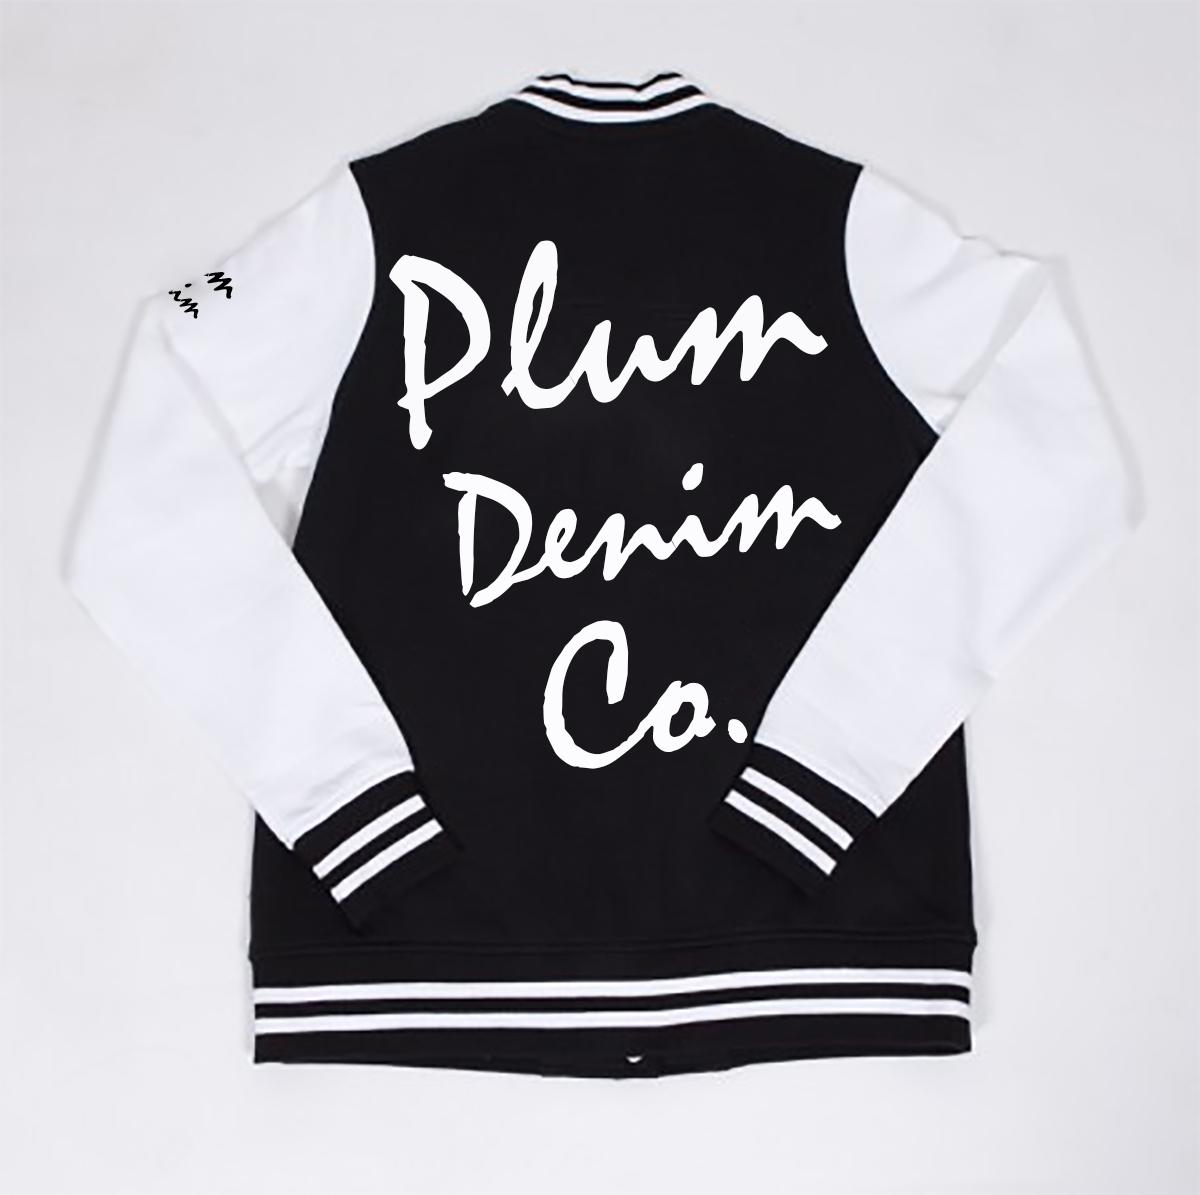 Plum Denim Co. Varsity Jacket Back